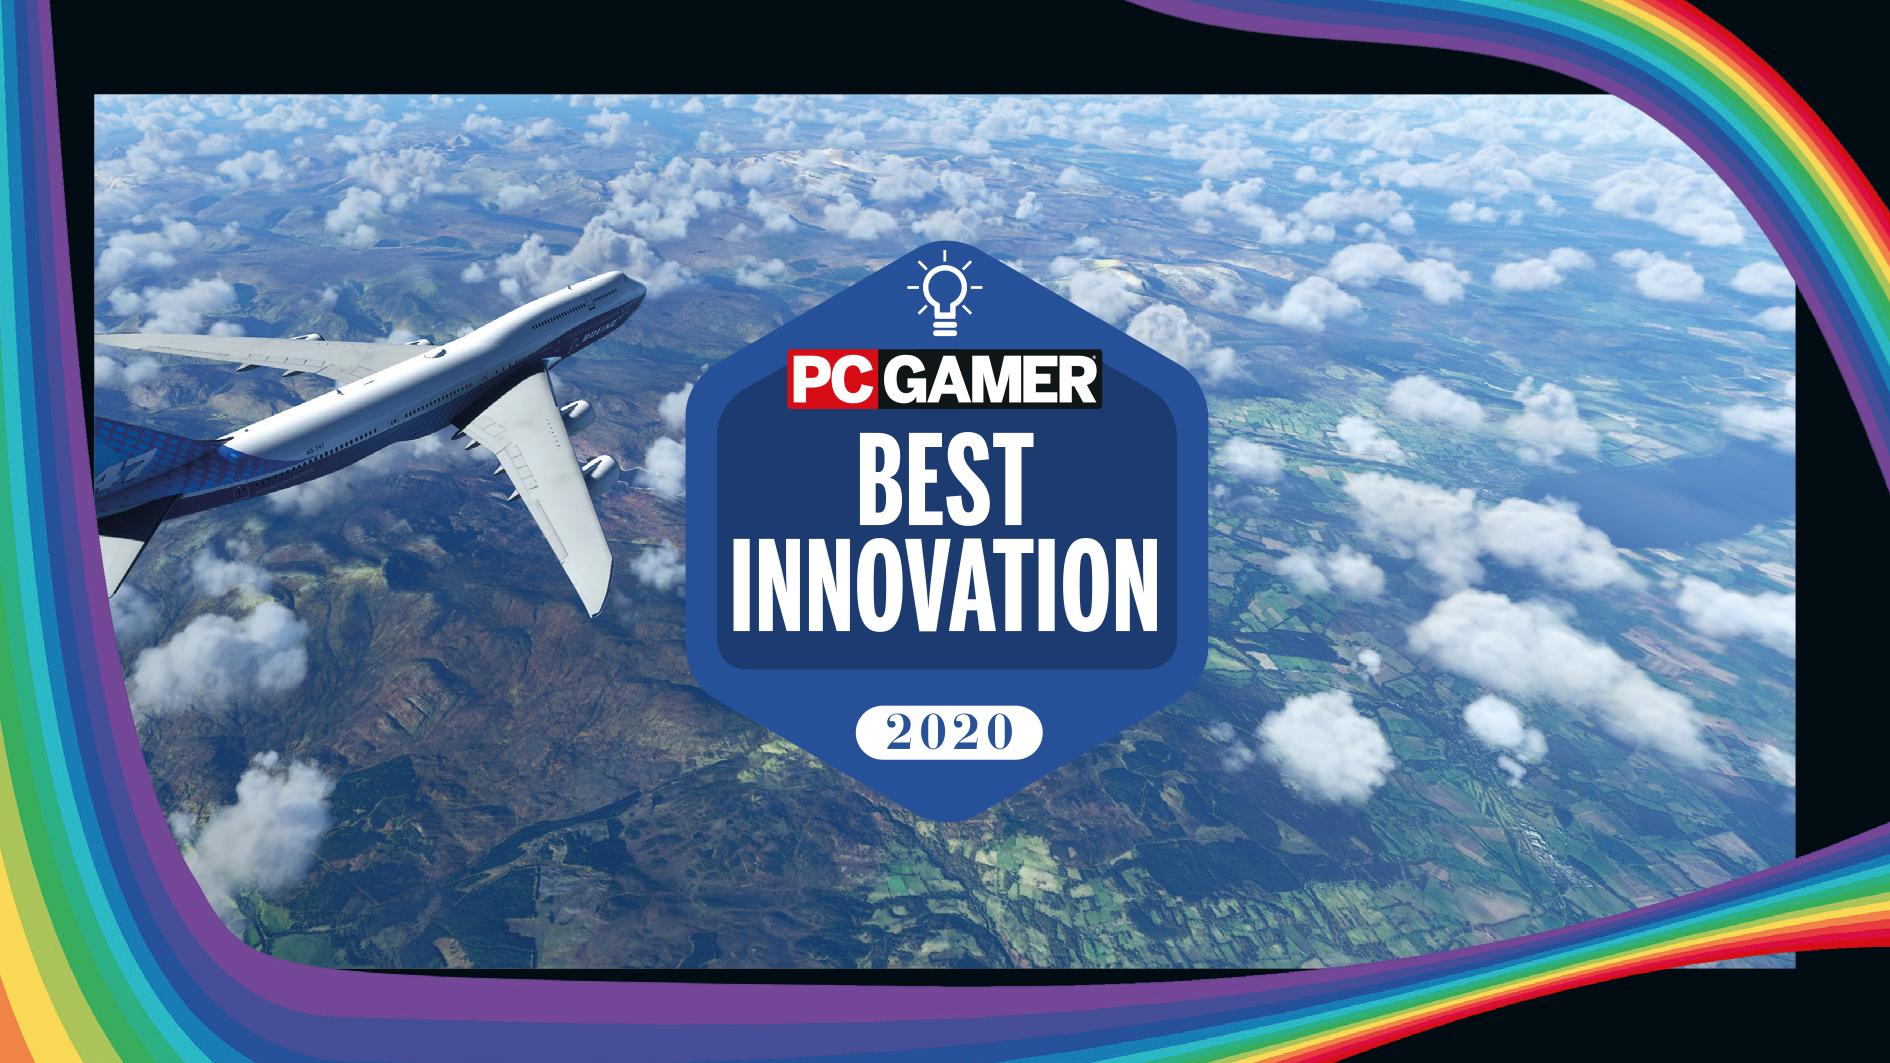 Best Innovation 2020: Microsoft Flight Simulator